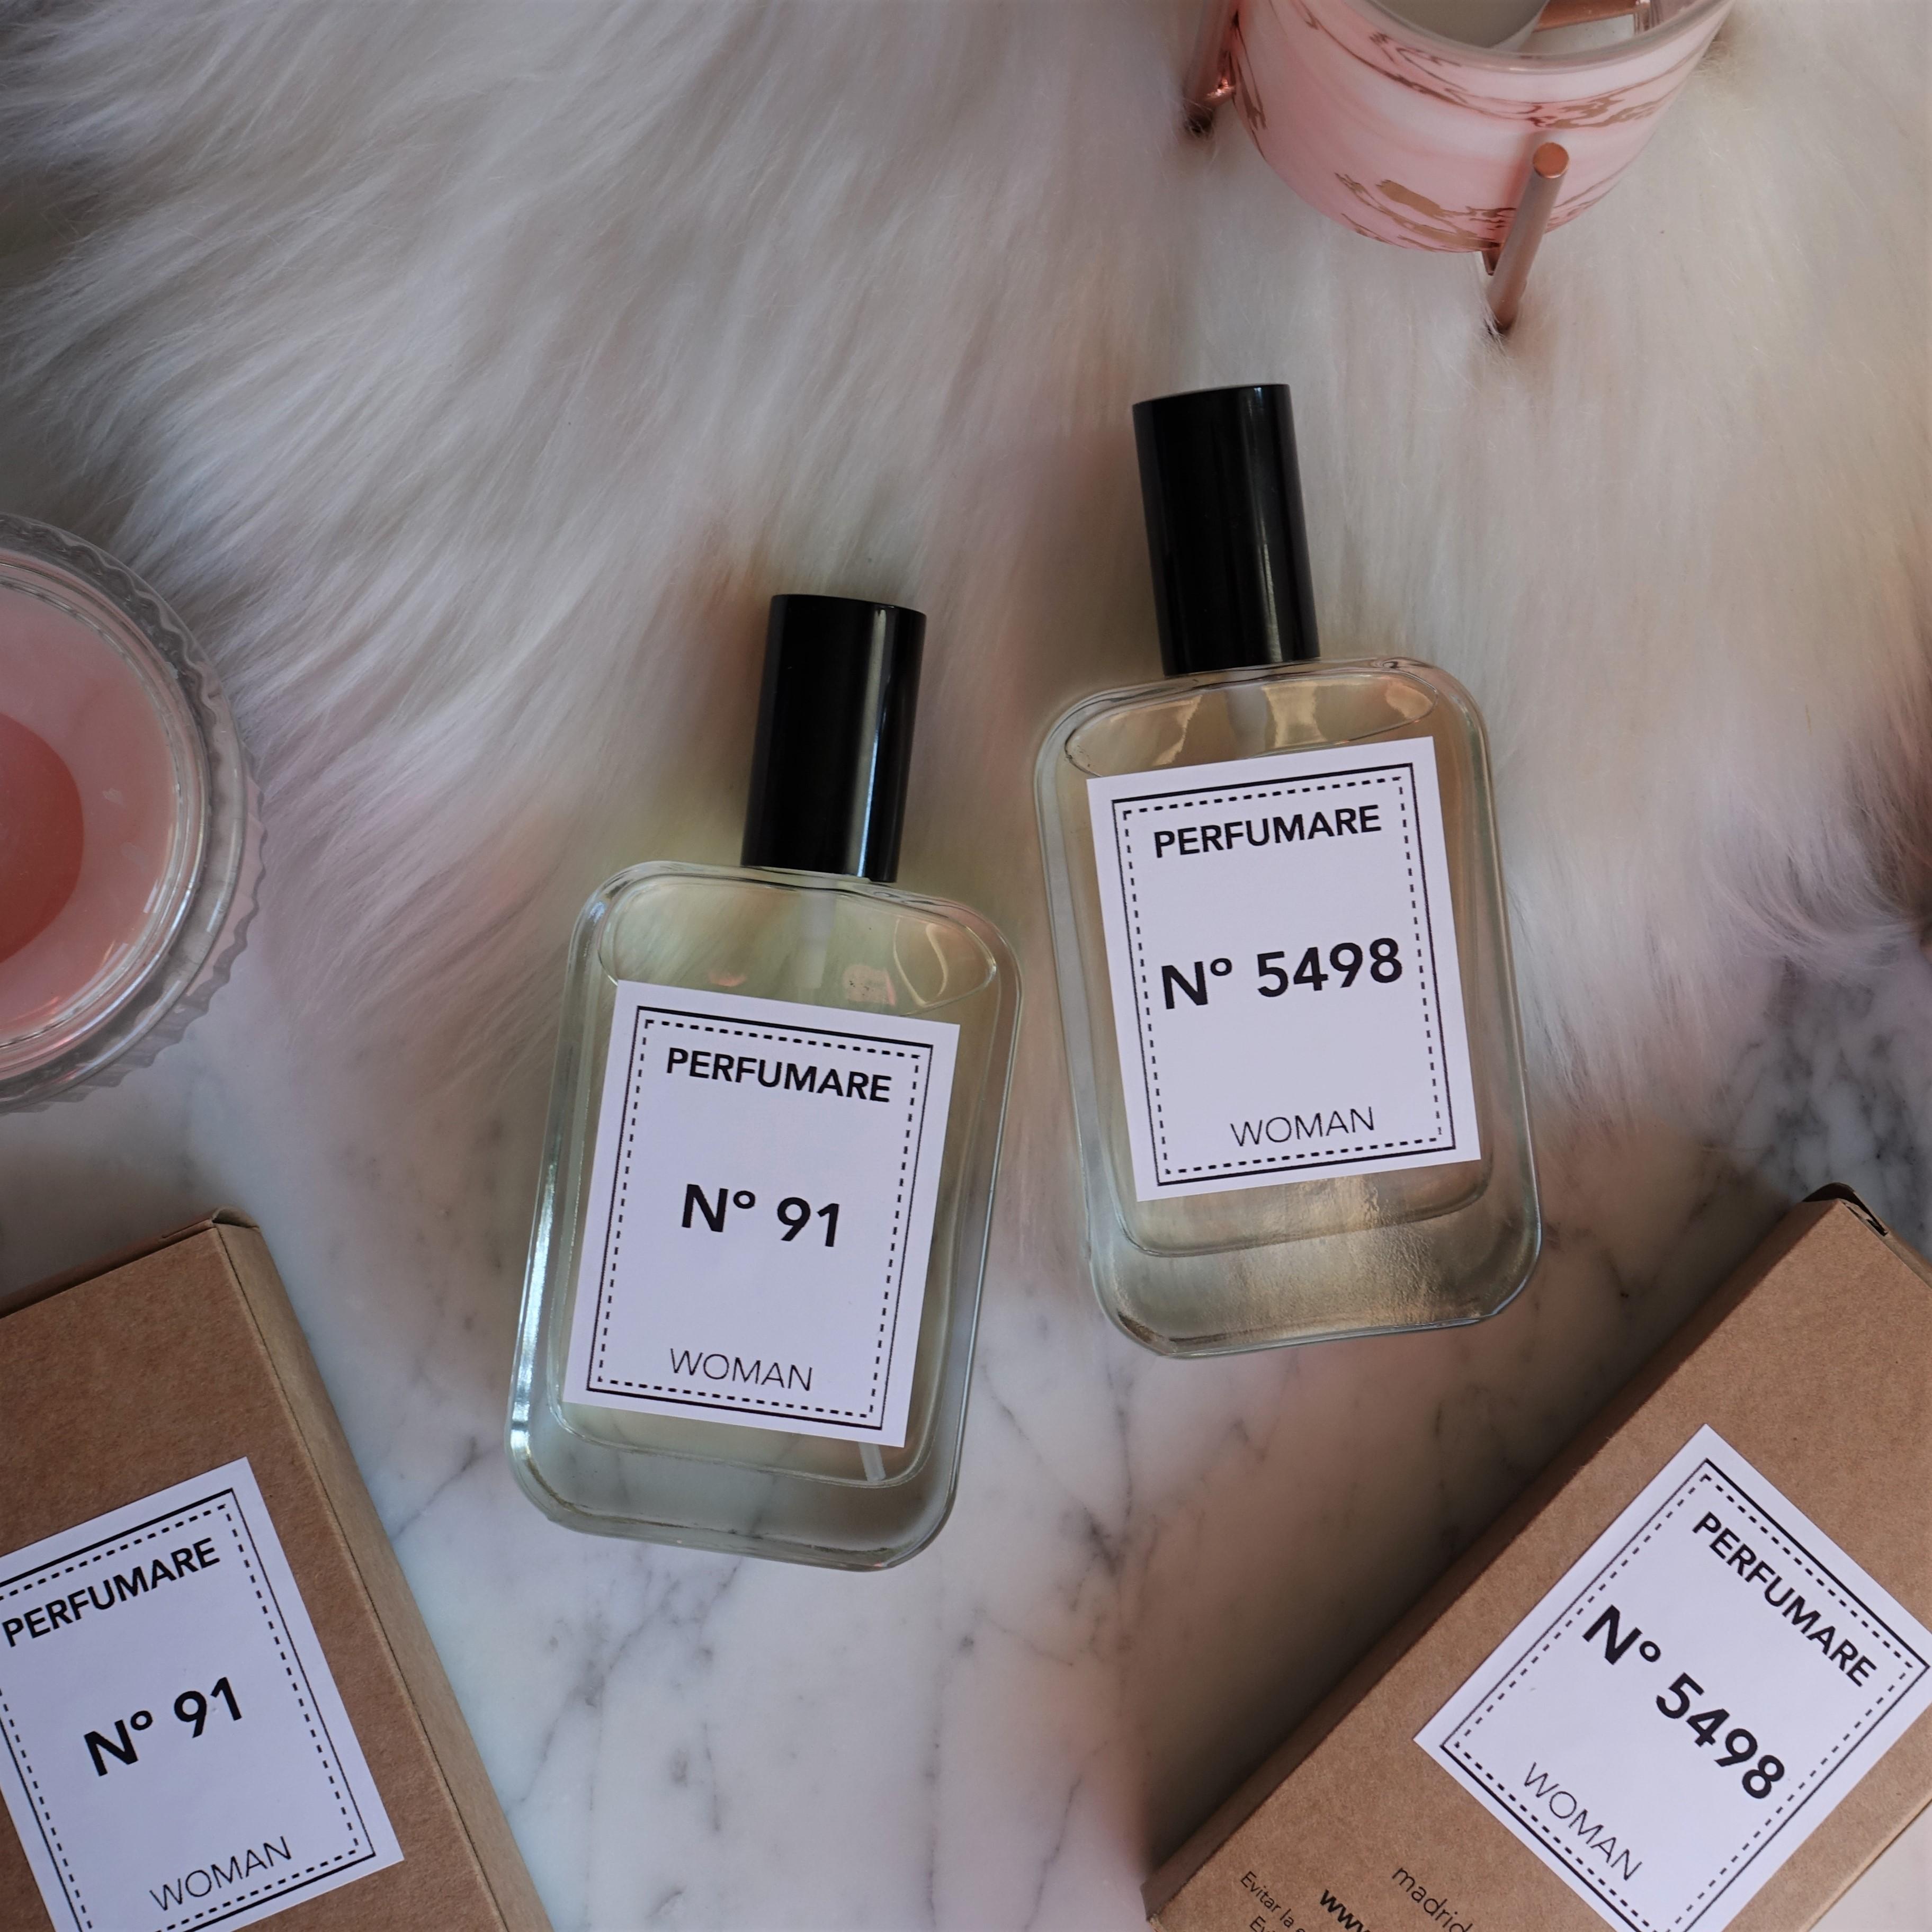 Perfumes Perfumare: Nº 91 (Alien de Thierry Mugler) y Nº 5498 (Fleur Musc For Her de Narciso Rodriguez) (Evento #YBB8ED de Girl Power Team)